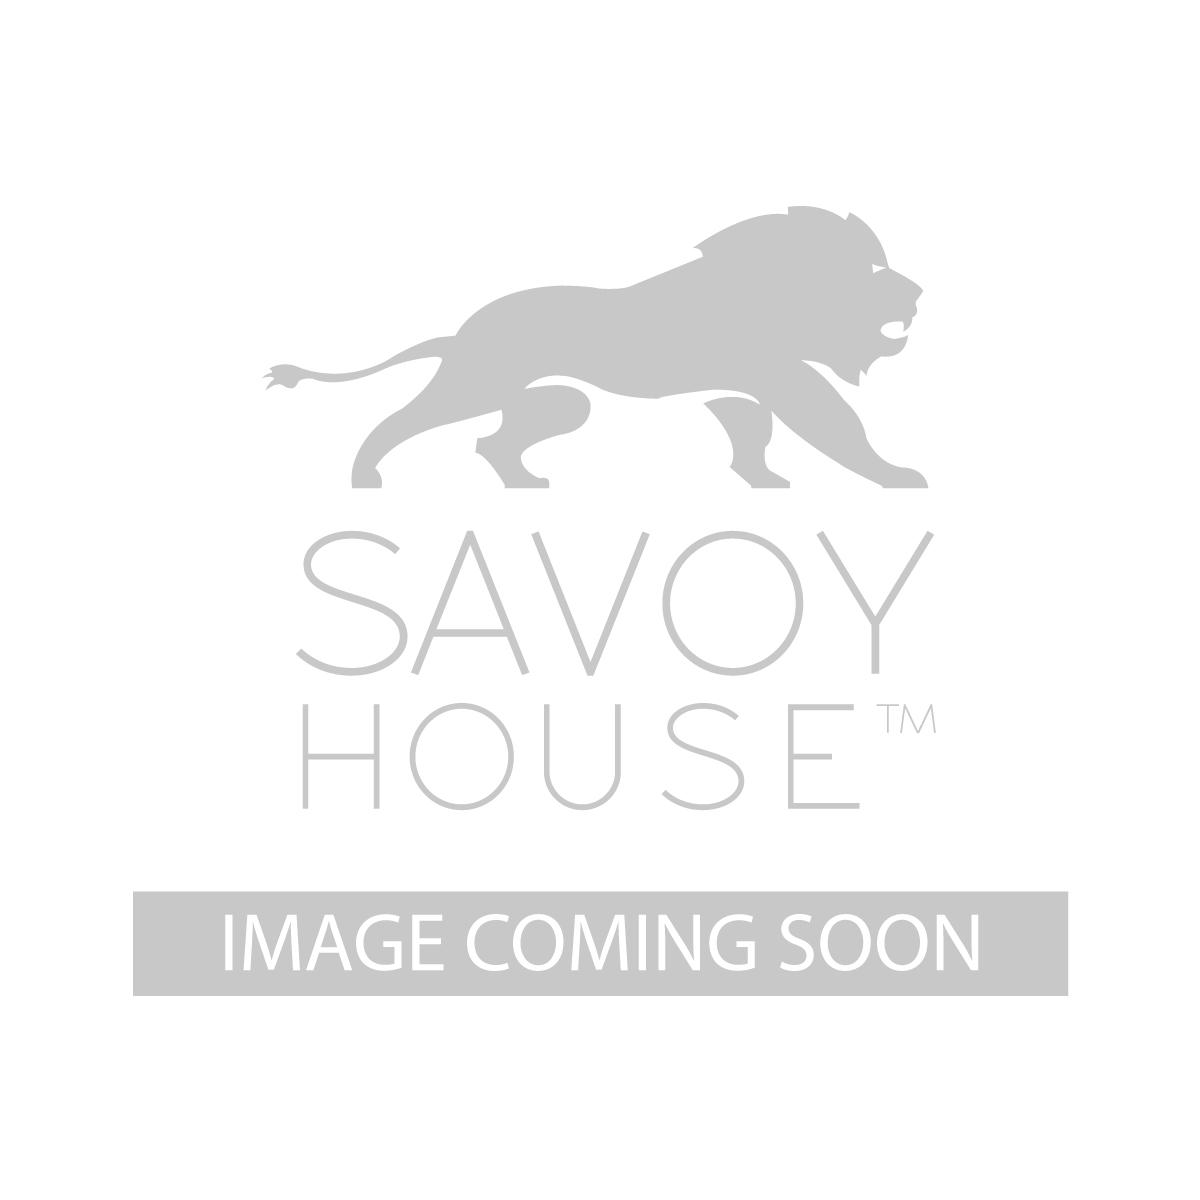 52 Sgb 5rv Sn Barbour Island Ceiling Fan By Savoy House